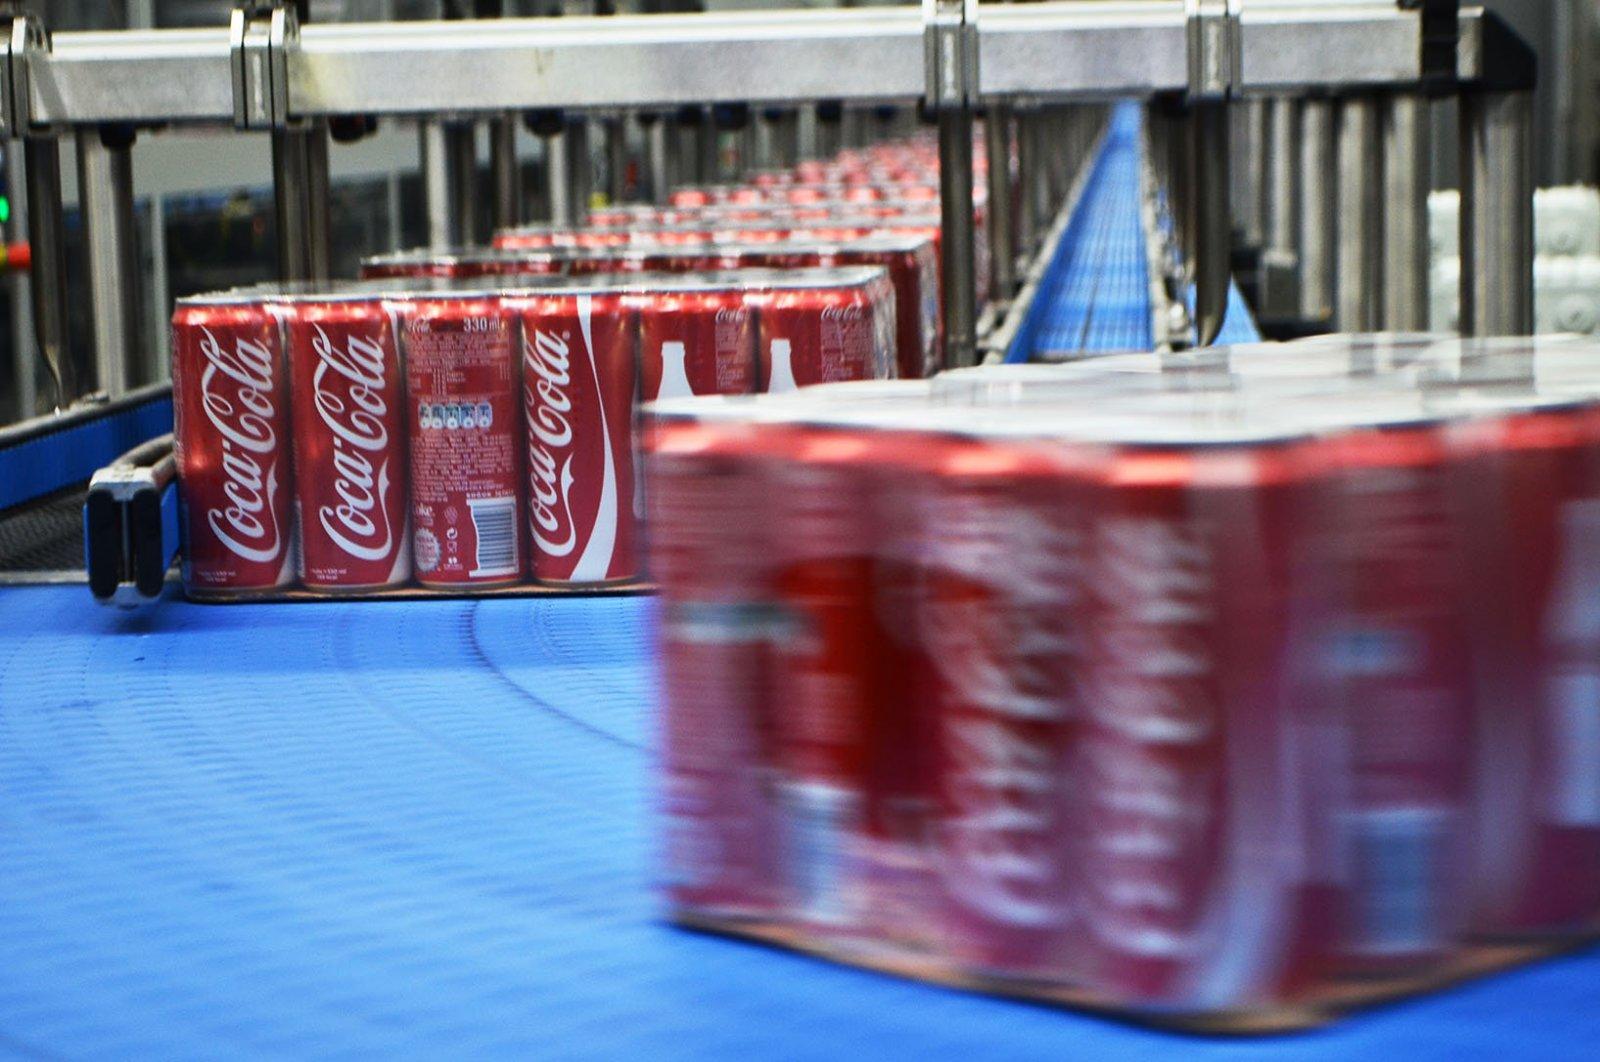 Coca Cola Içecek's factory in western Turkey's Isparta, Sunday, March 29, 2017.